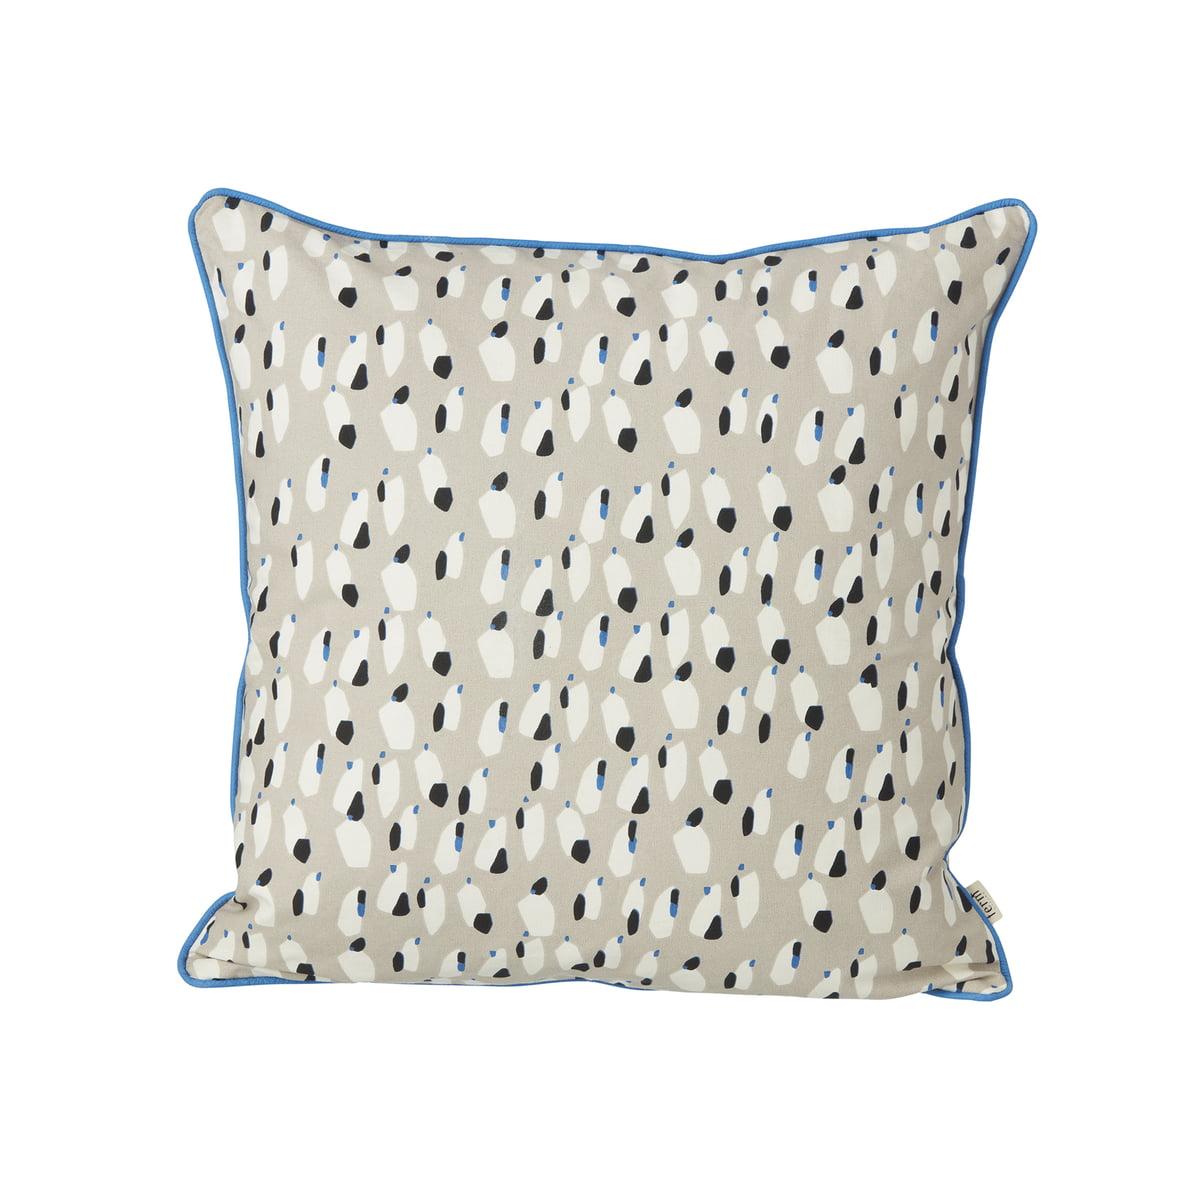 spotted kissen von ferm living im shop. Black Bedroom Furniture Sets. Home Design Ideas